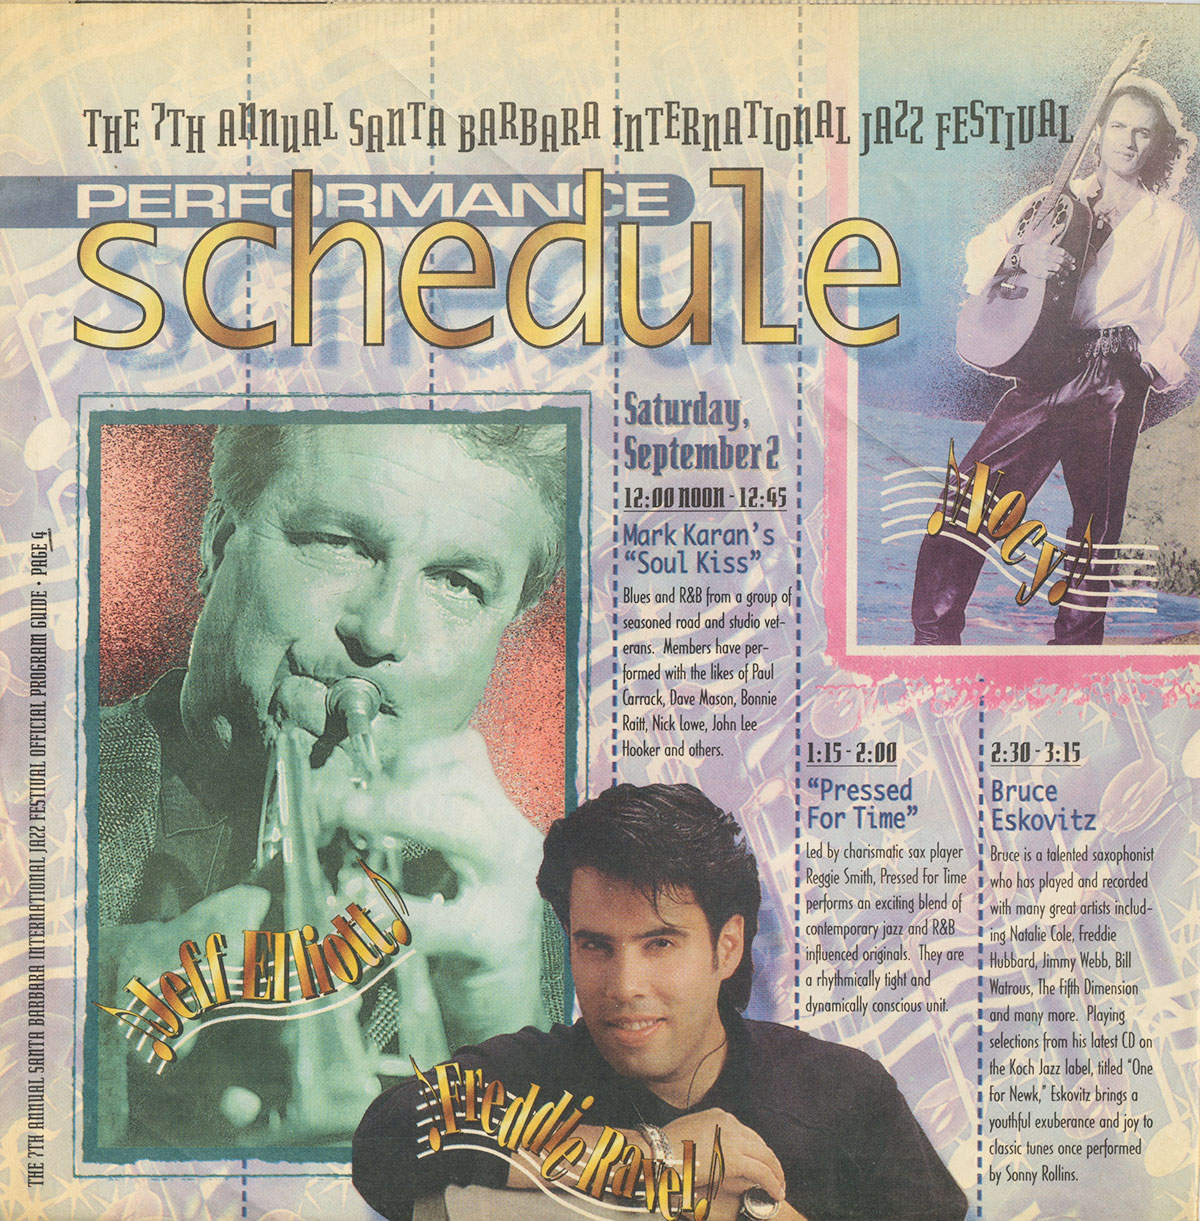 7th Annual Santa Barbara International Jazz Festival Official Program Guide, Sept. 2, 1995